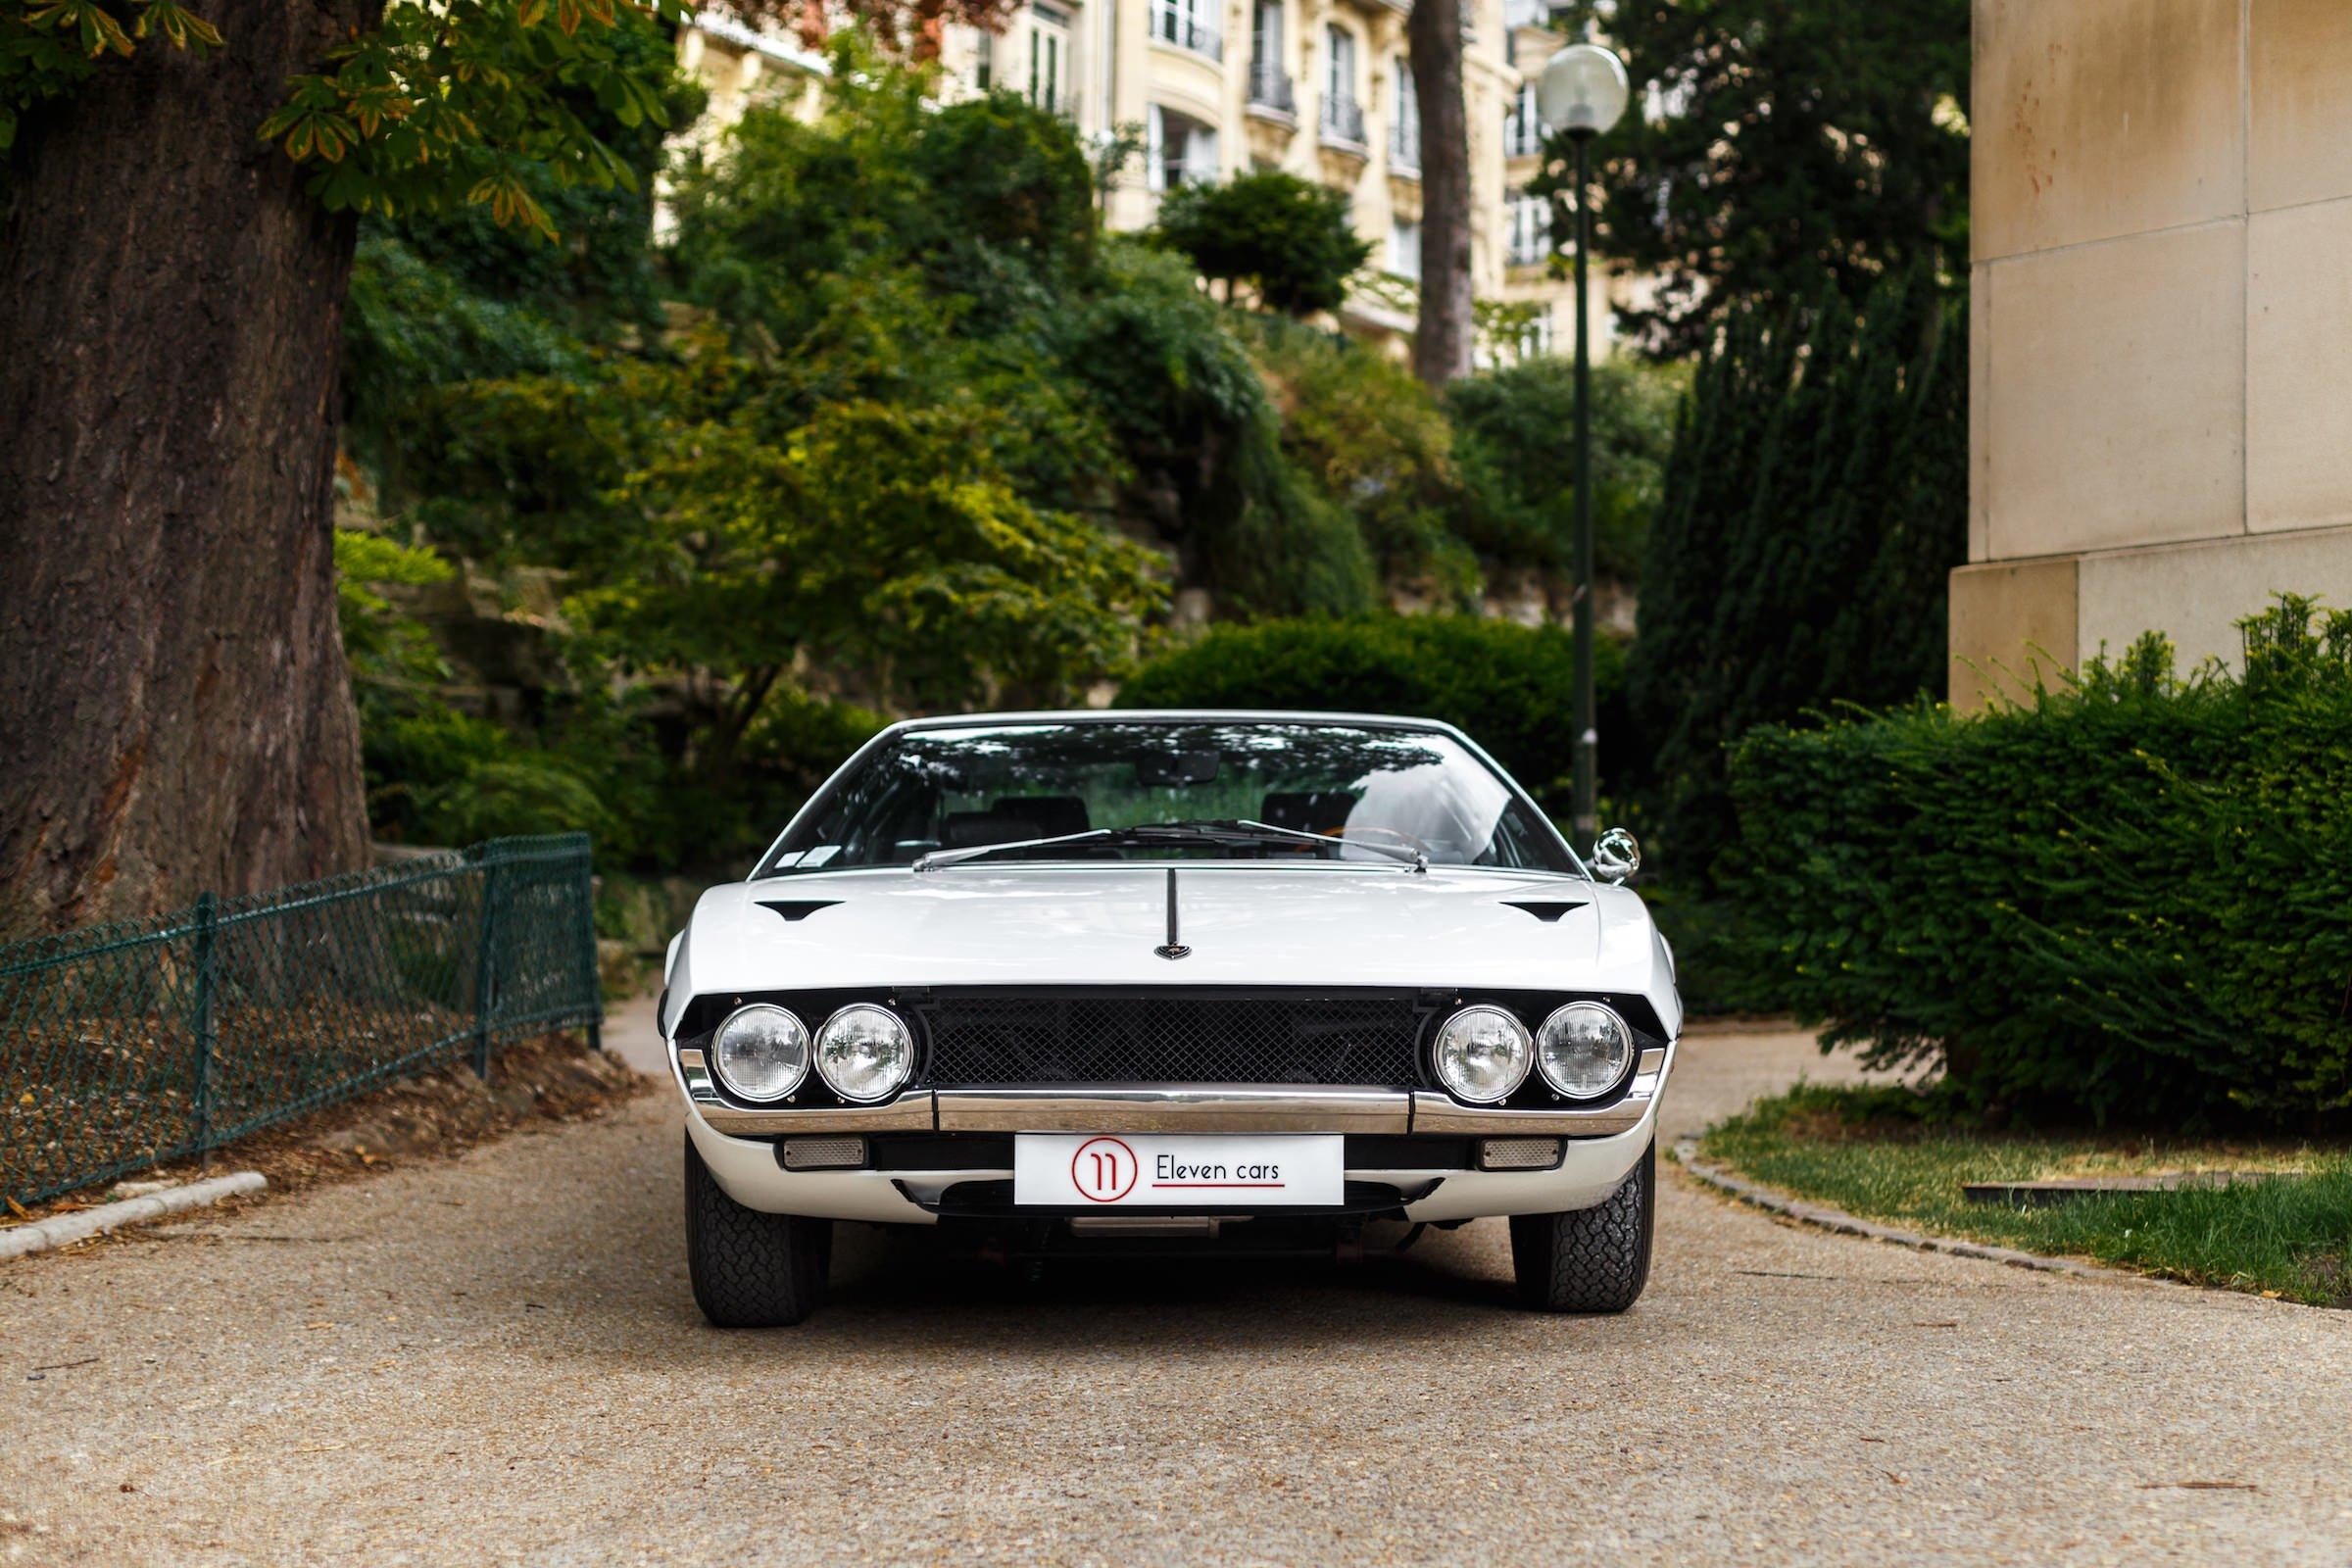 https://silodrome.com/wp-content/uploads/2017/10/Lamborghini-Espada-11.jpeg